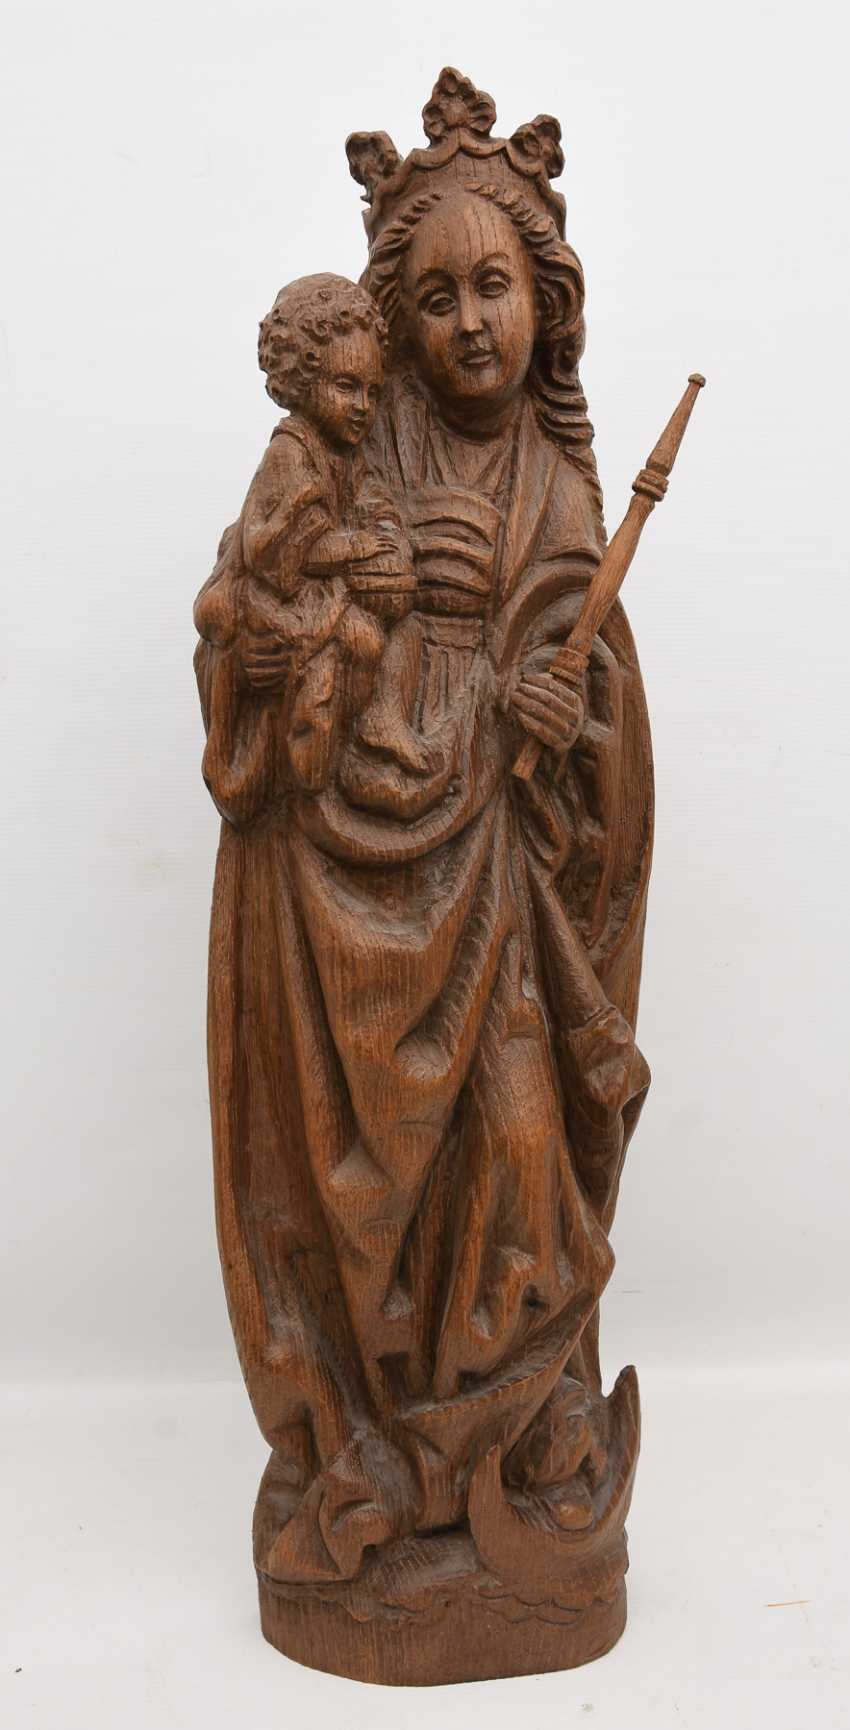 OSNABRÜCK MADONNA, copy after the Original, beschnitztes wood, antique stained, Oberammergau, 20. Century - photo 1